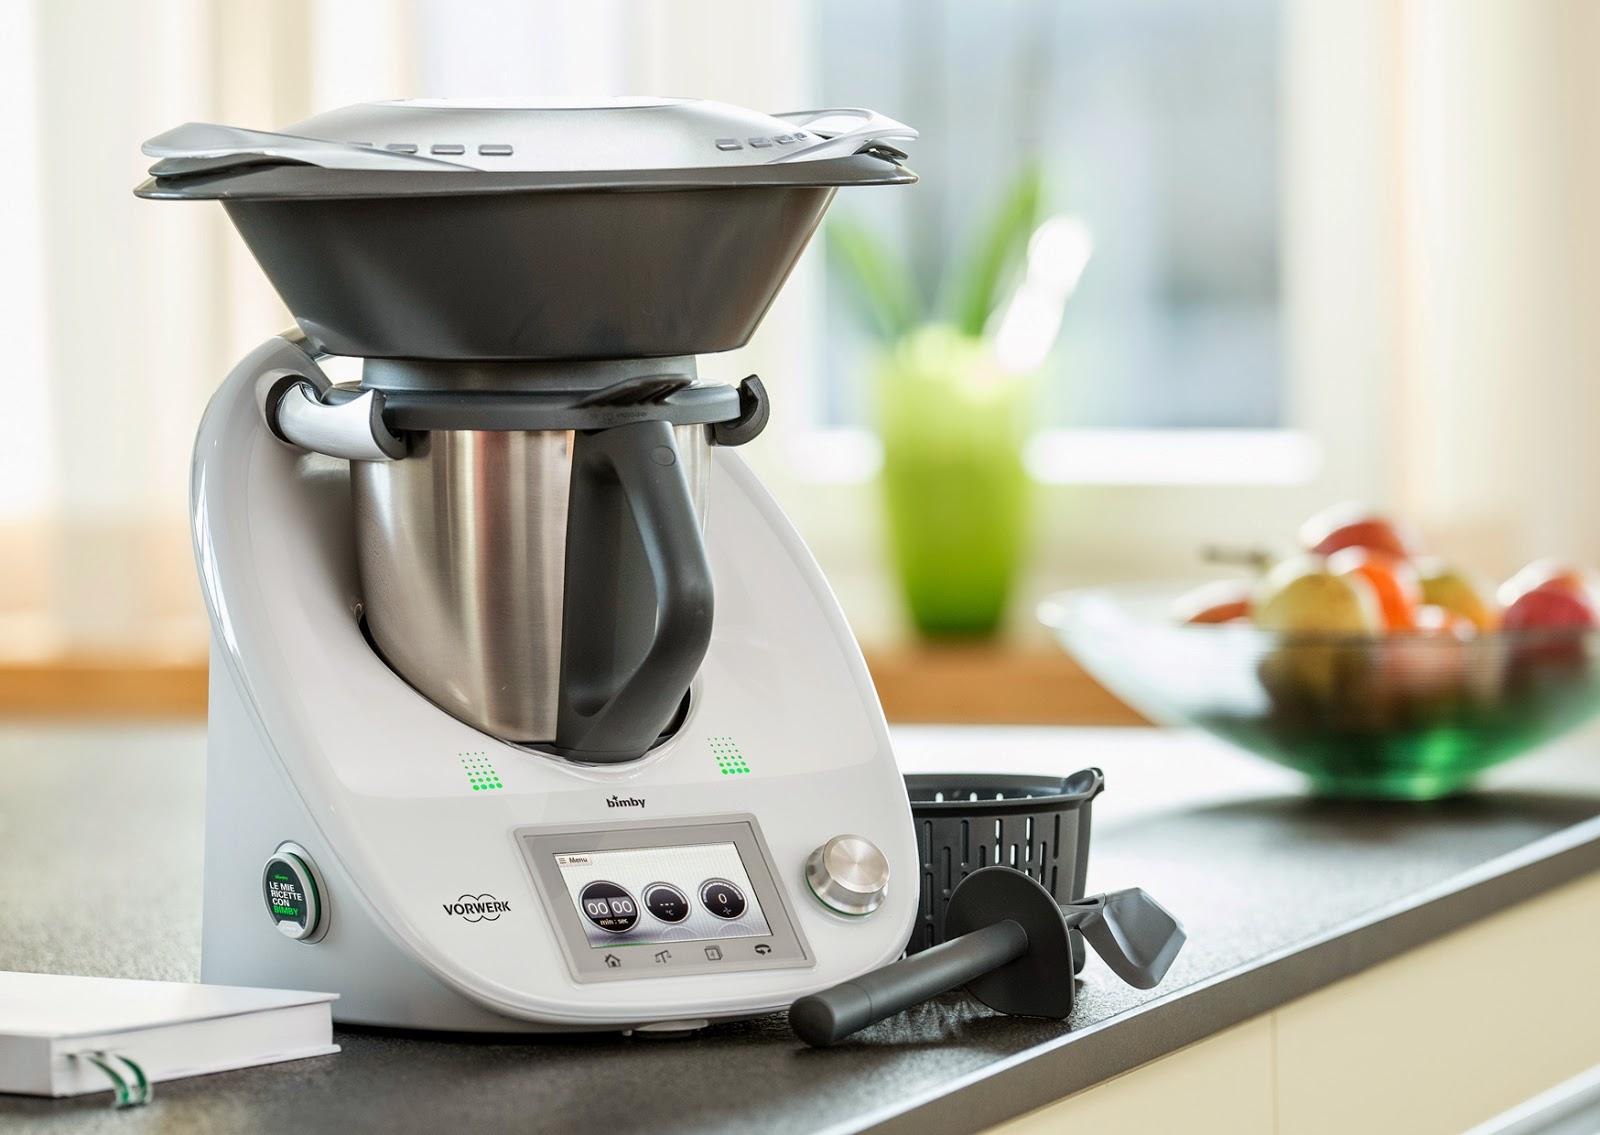 Best Bimbi Robot Cucina Images - House Interior - kurdistant.info